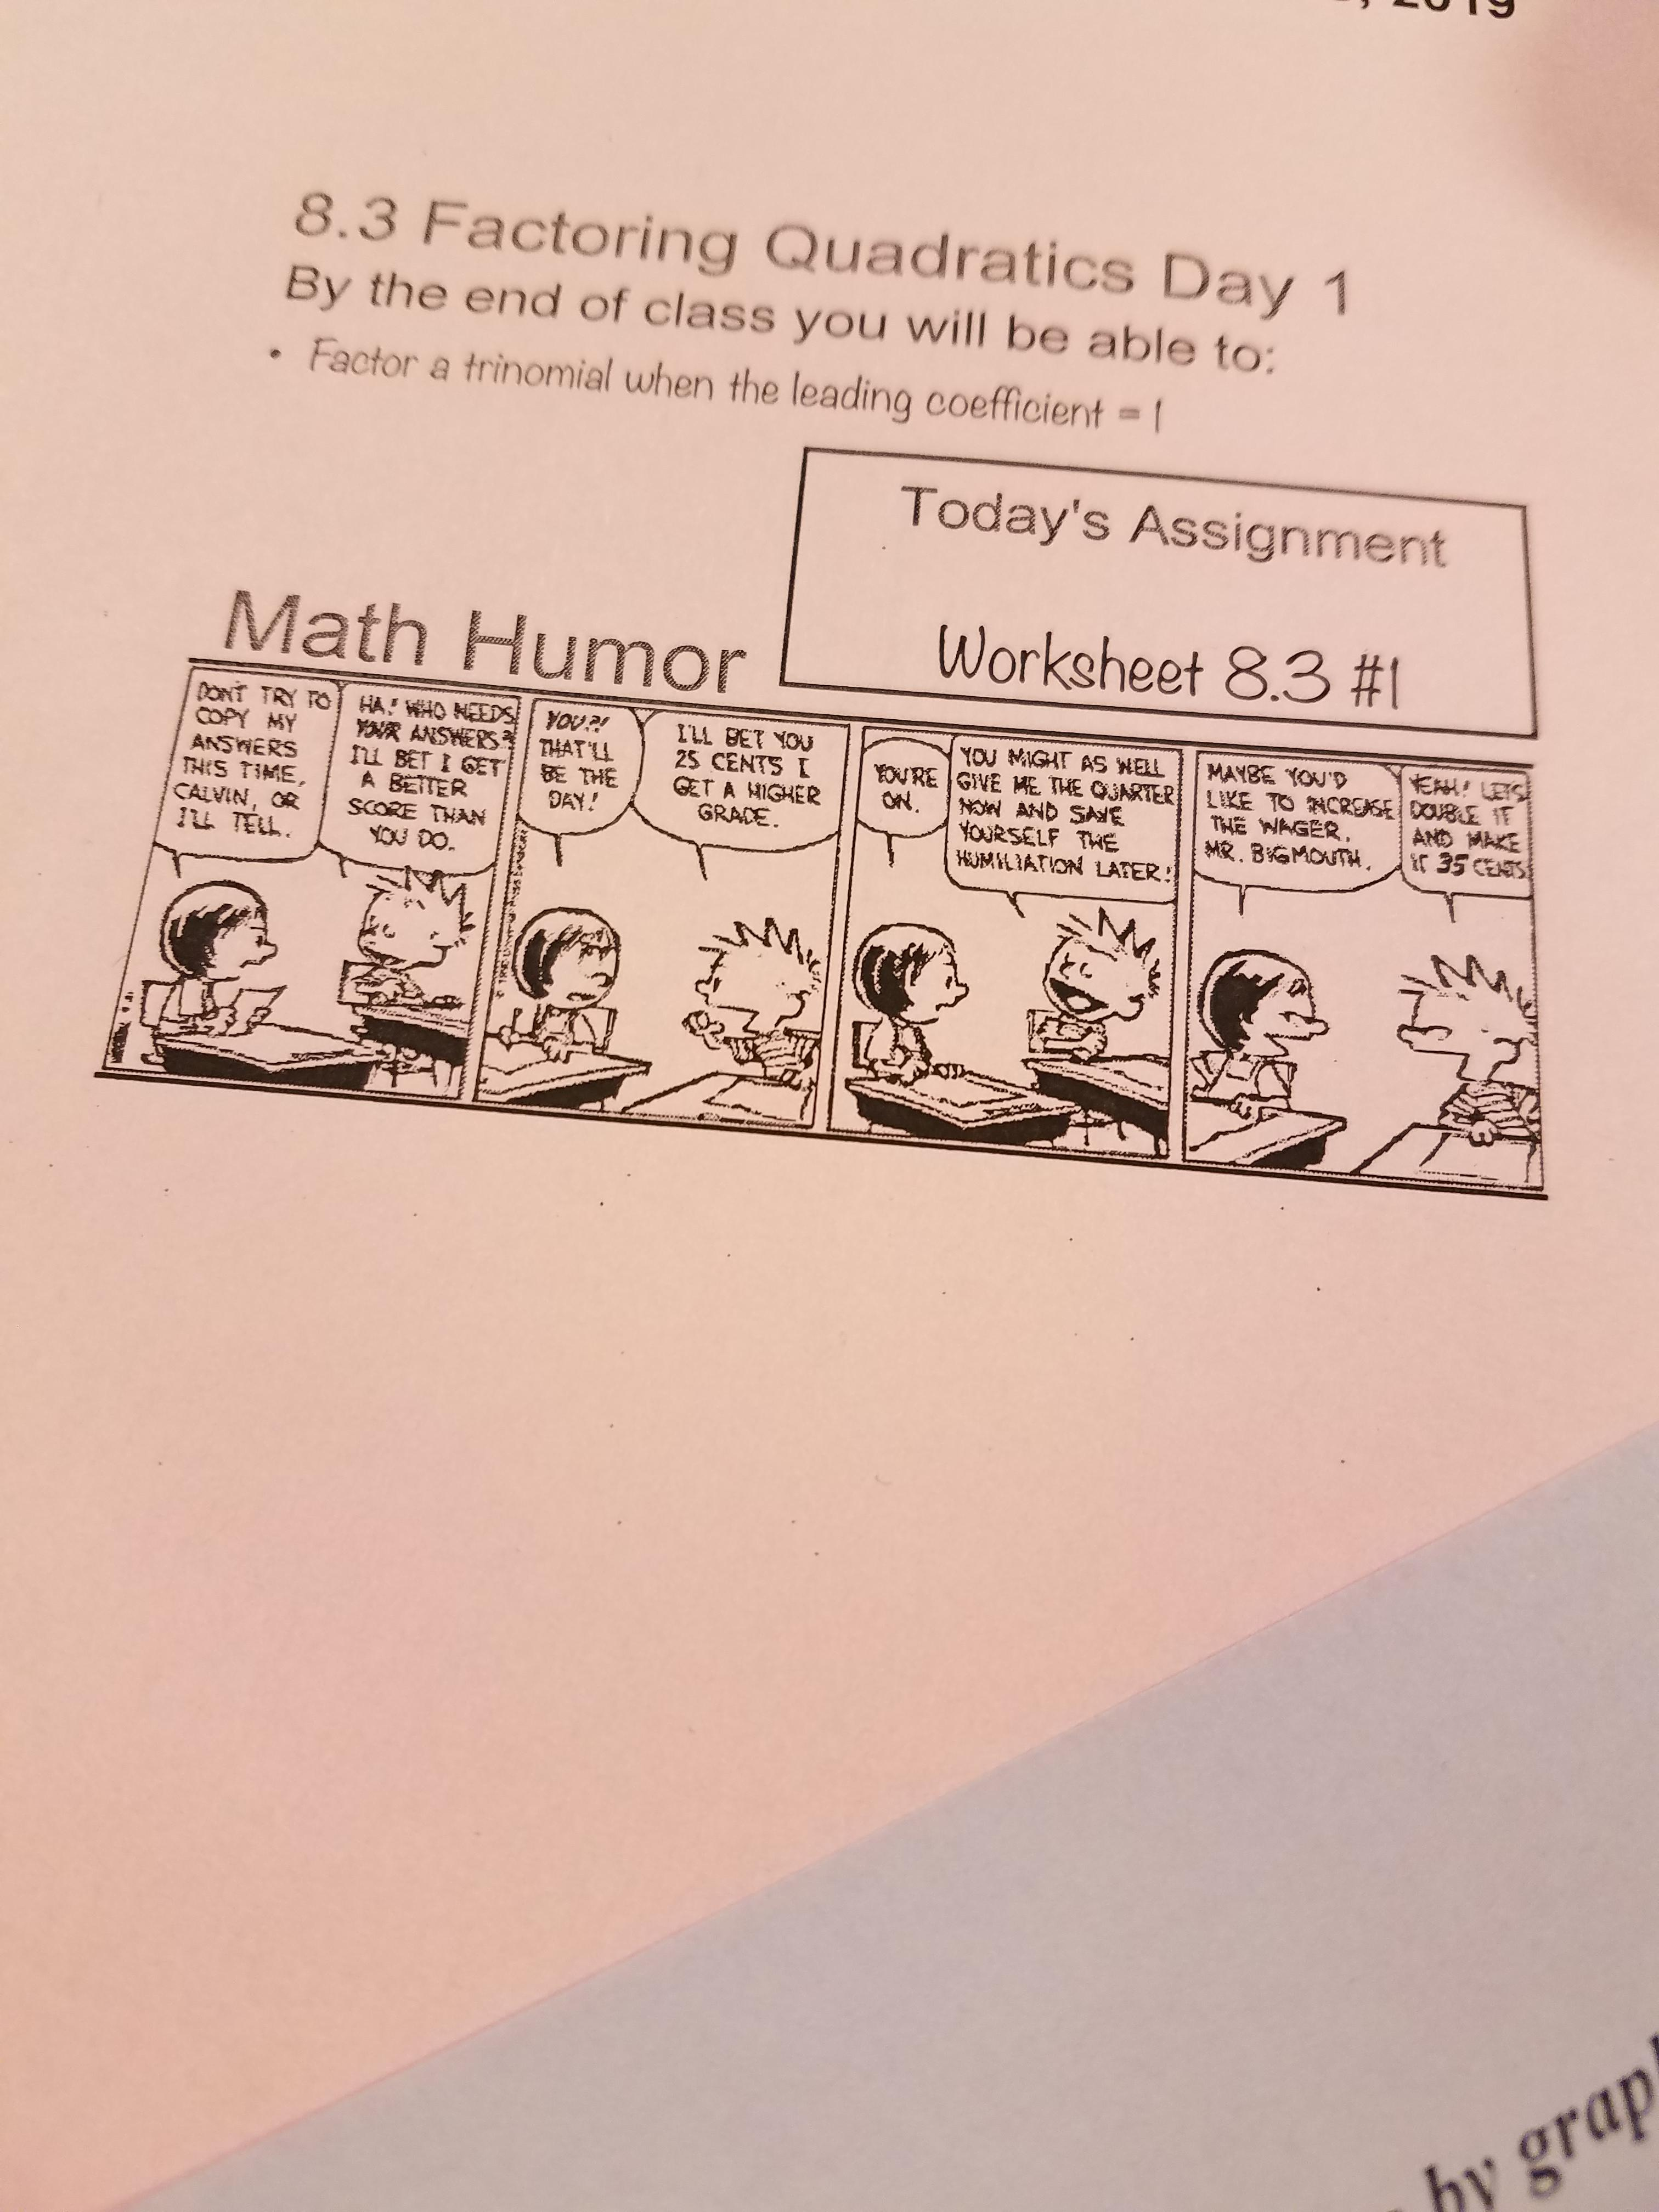 My Algebra Teacher Out A Calvin And Hobbes Comic Strip On